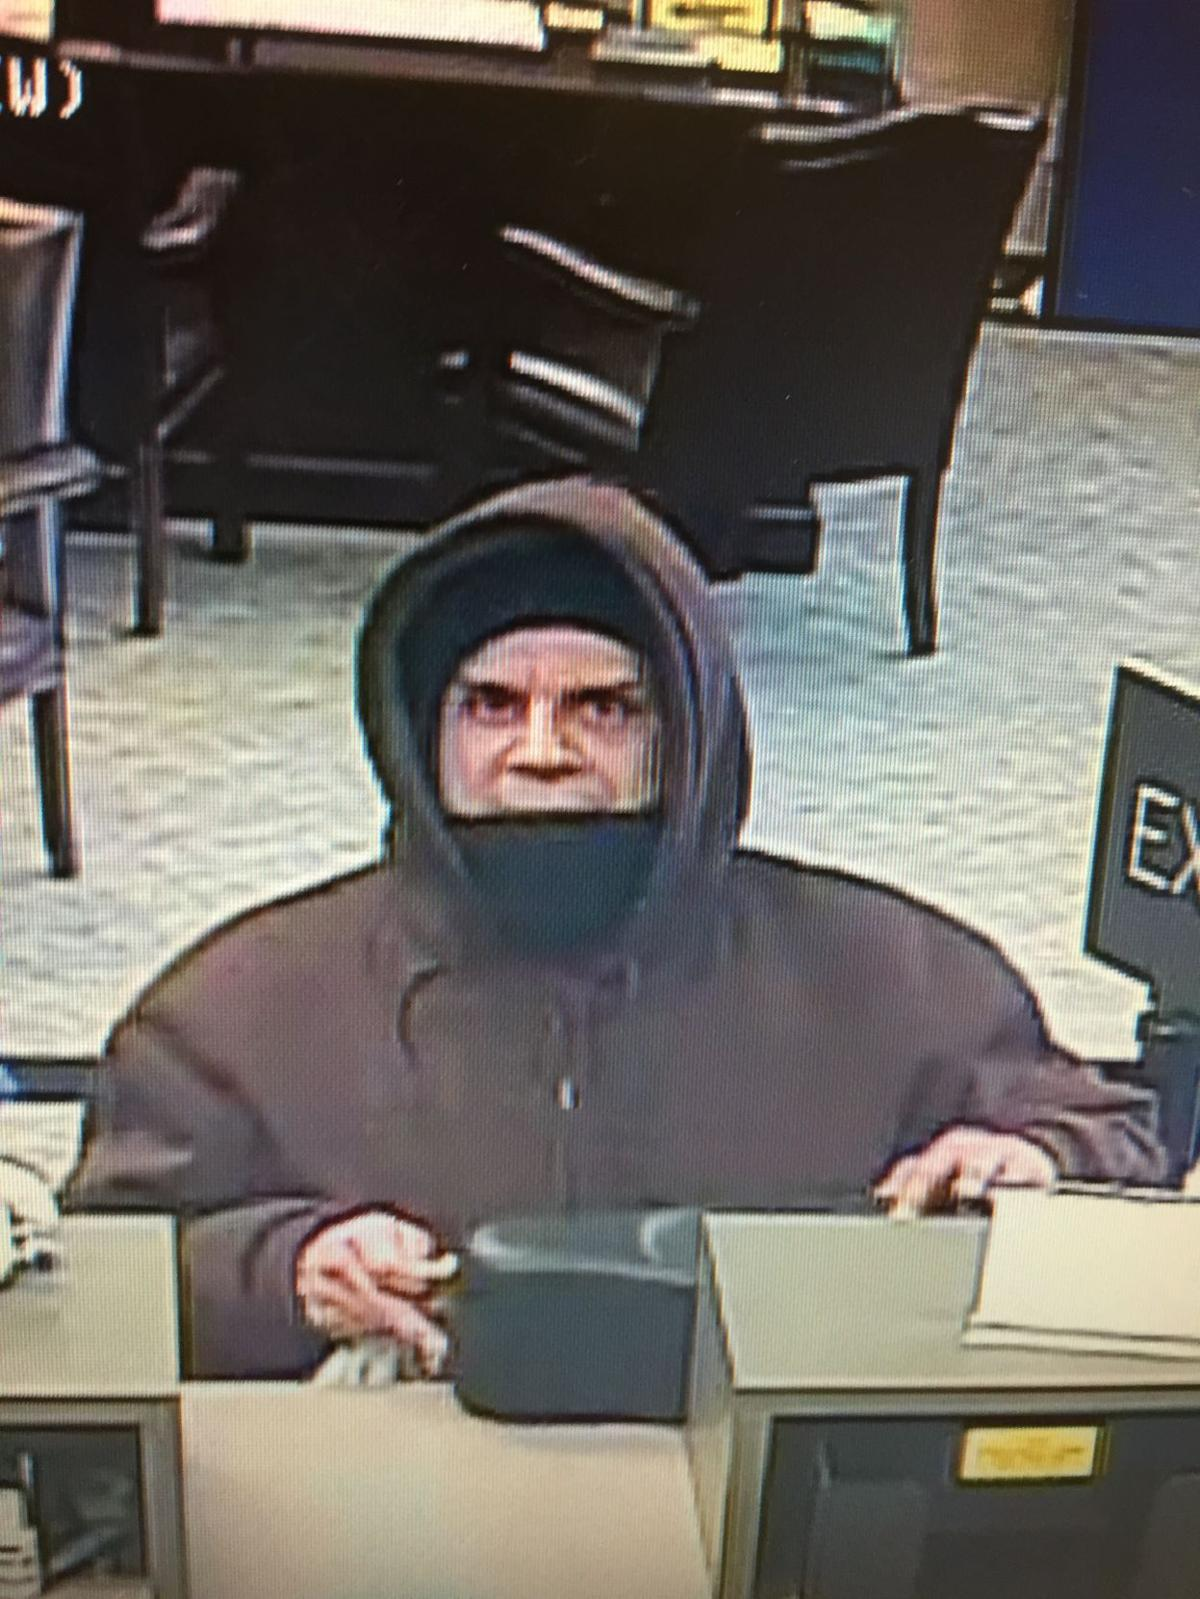 LG bank robber